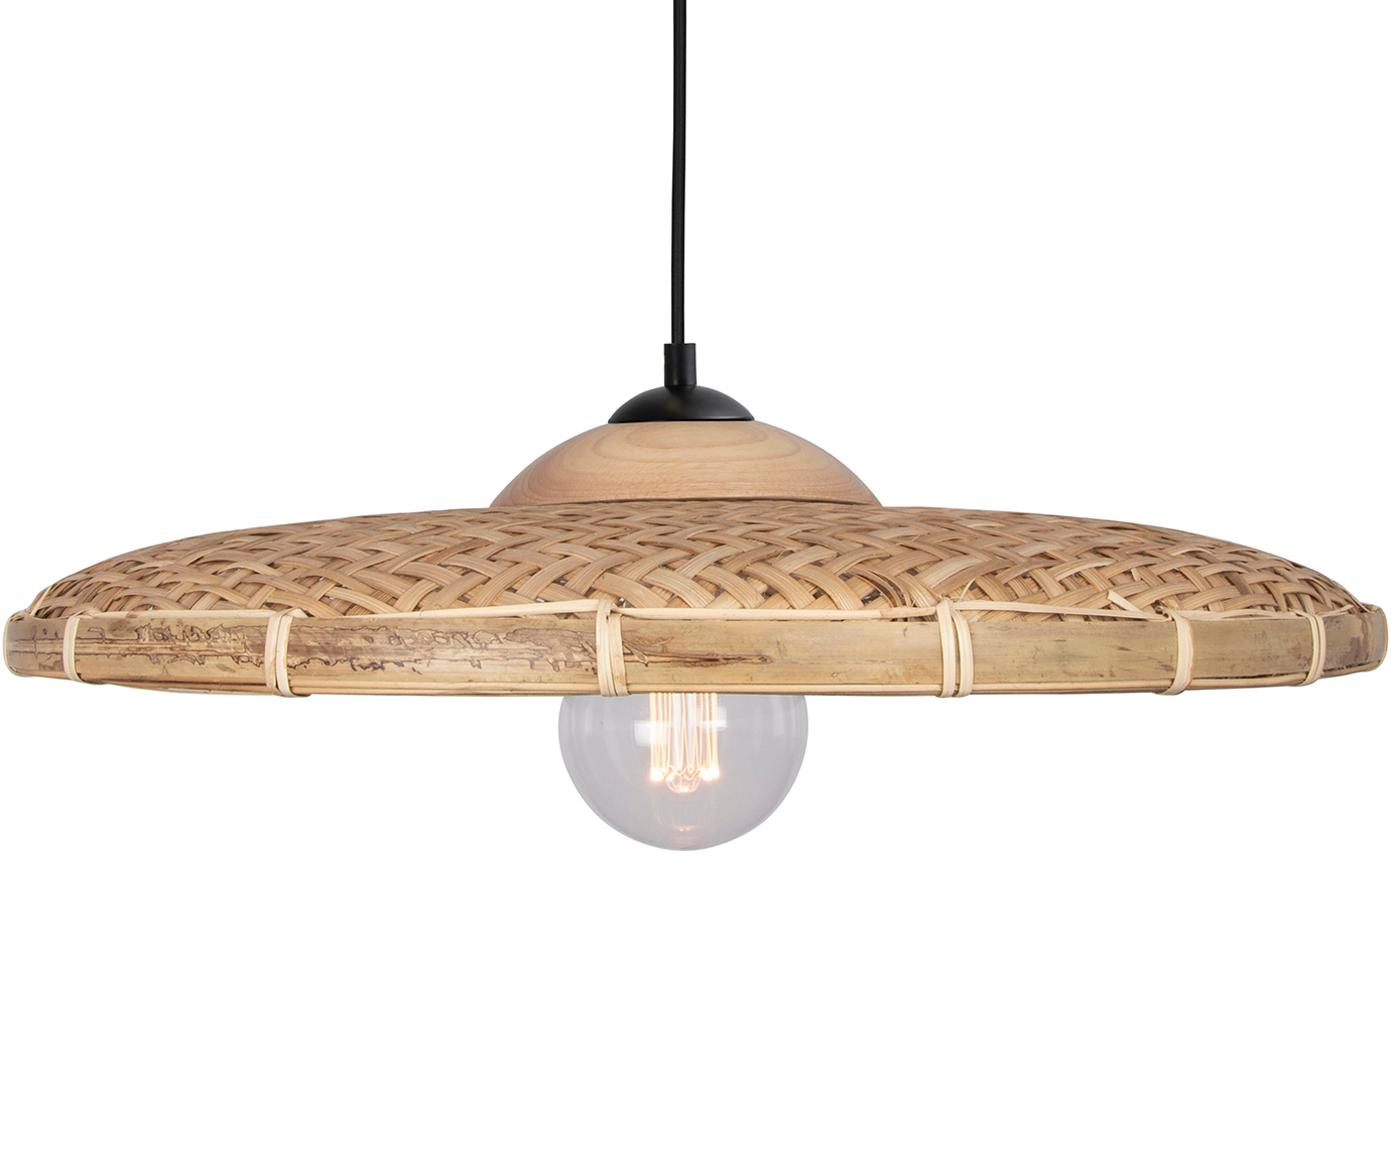 Hanglamp Aruba van rotan, Lampenkap: rotan, Baldakijn: gecoat metaal, Rotankleurig, Ø 50 x H 15 cm